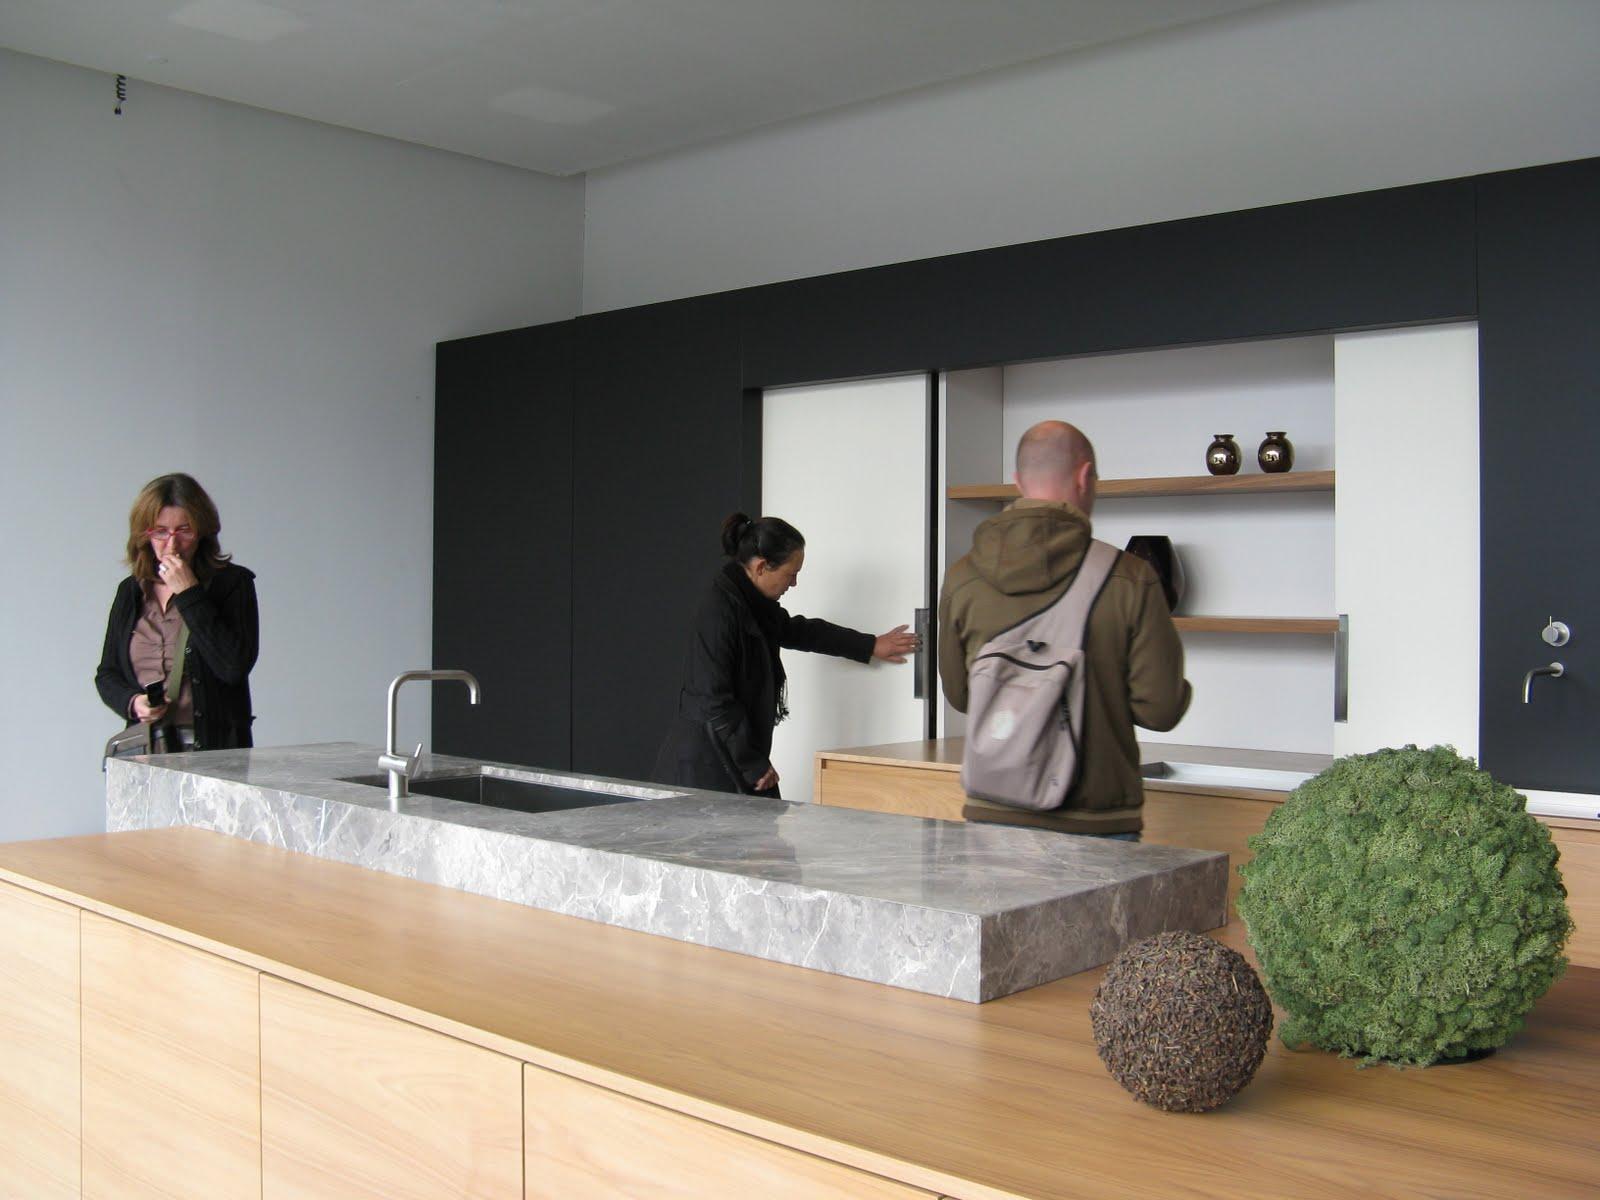 Houten Keuken Ideas : Atelier binnenhuisarchitectuur wilfra keukens